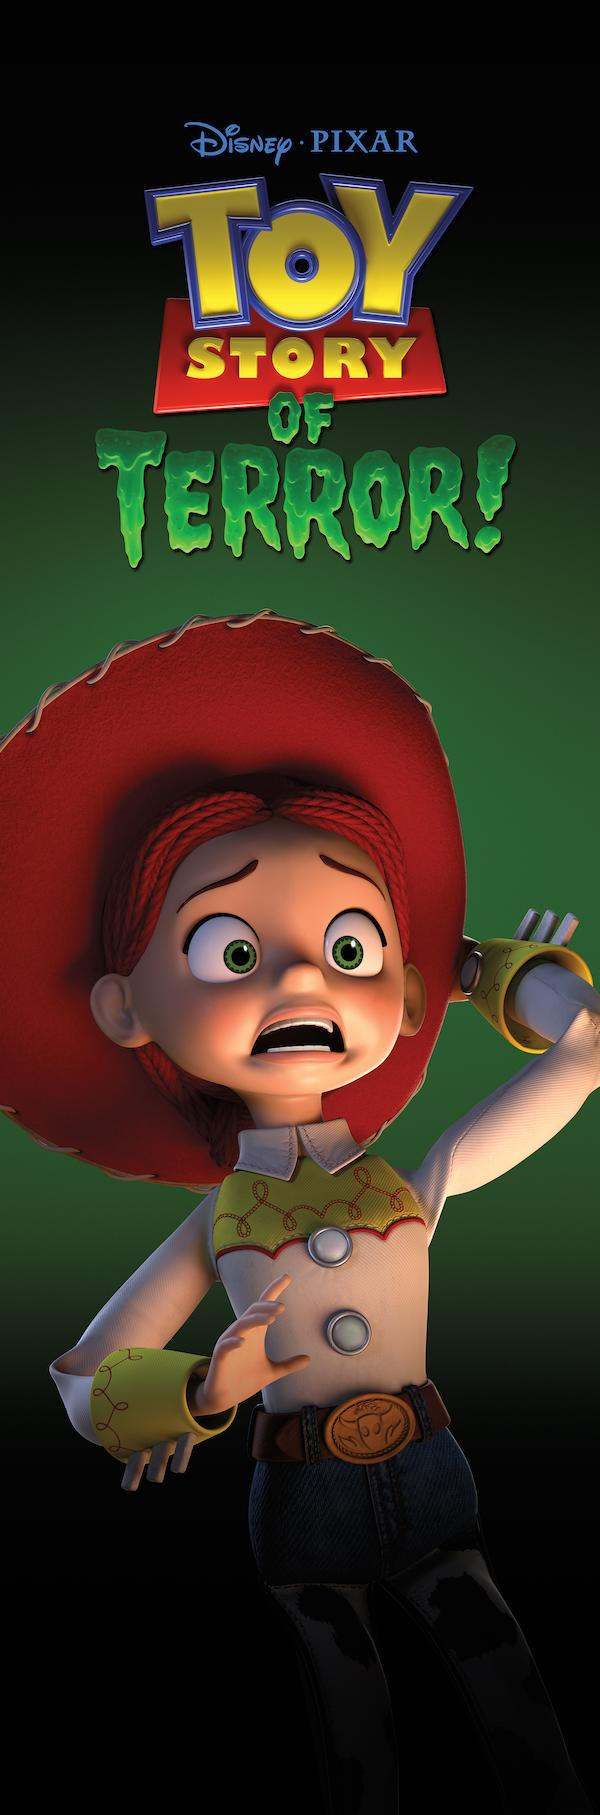 Toy Story of Terror 1653x5000